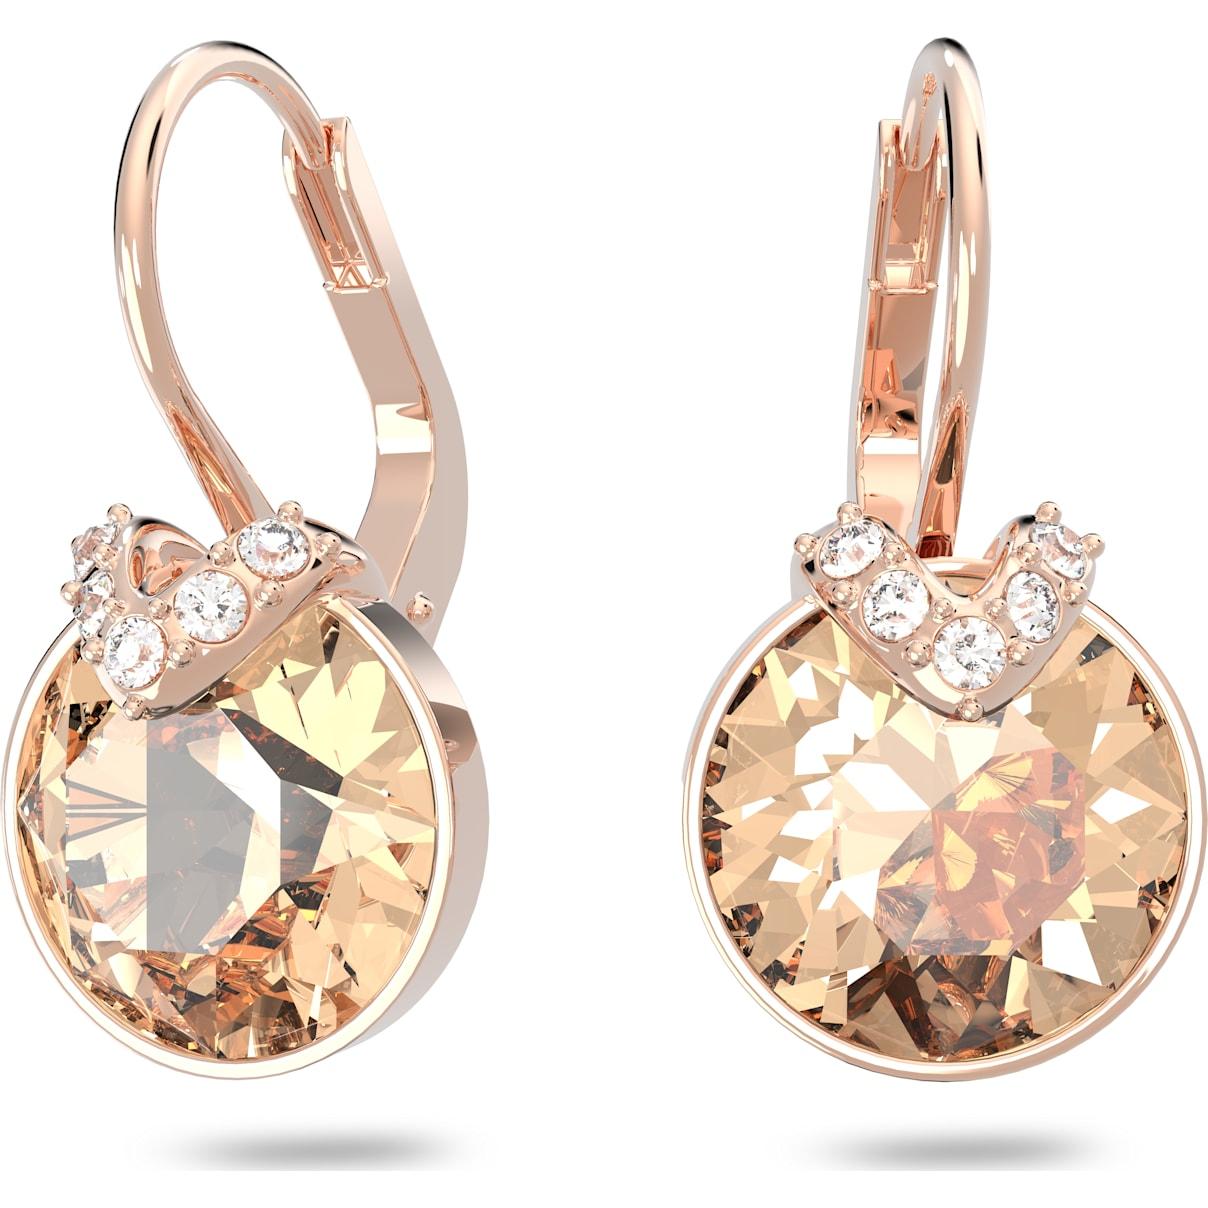 Swarovski Bella V Pierced Earrings, Pink, Rose-gold tone plated